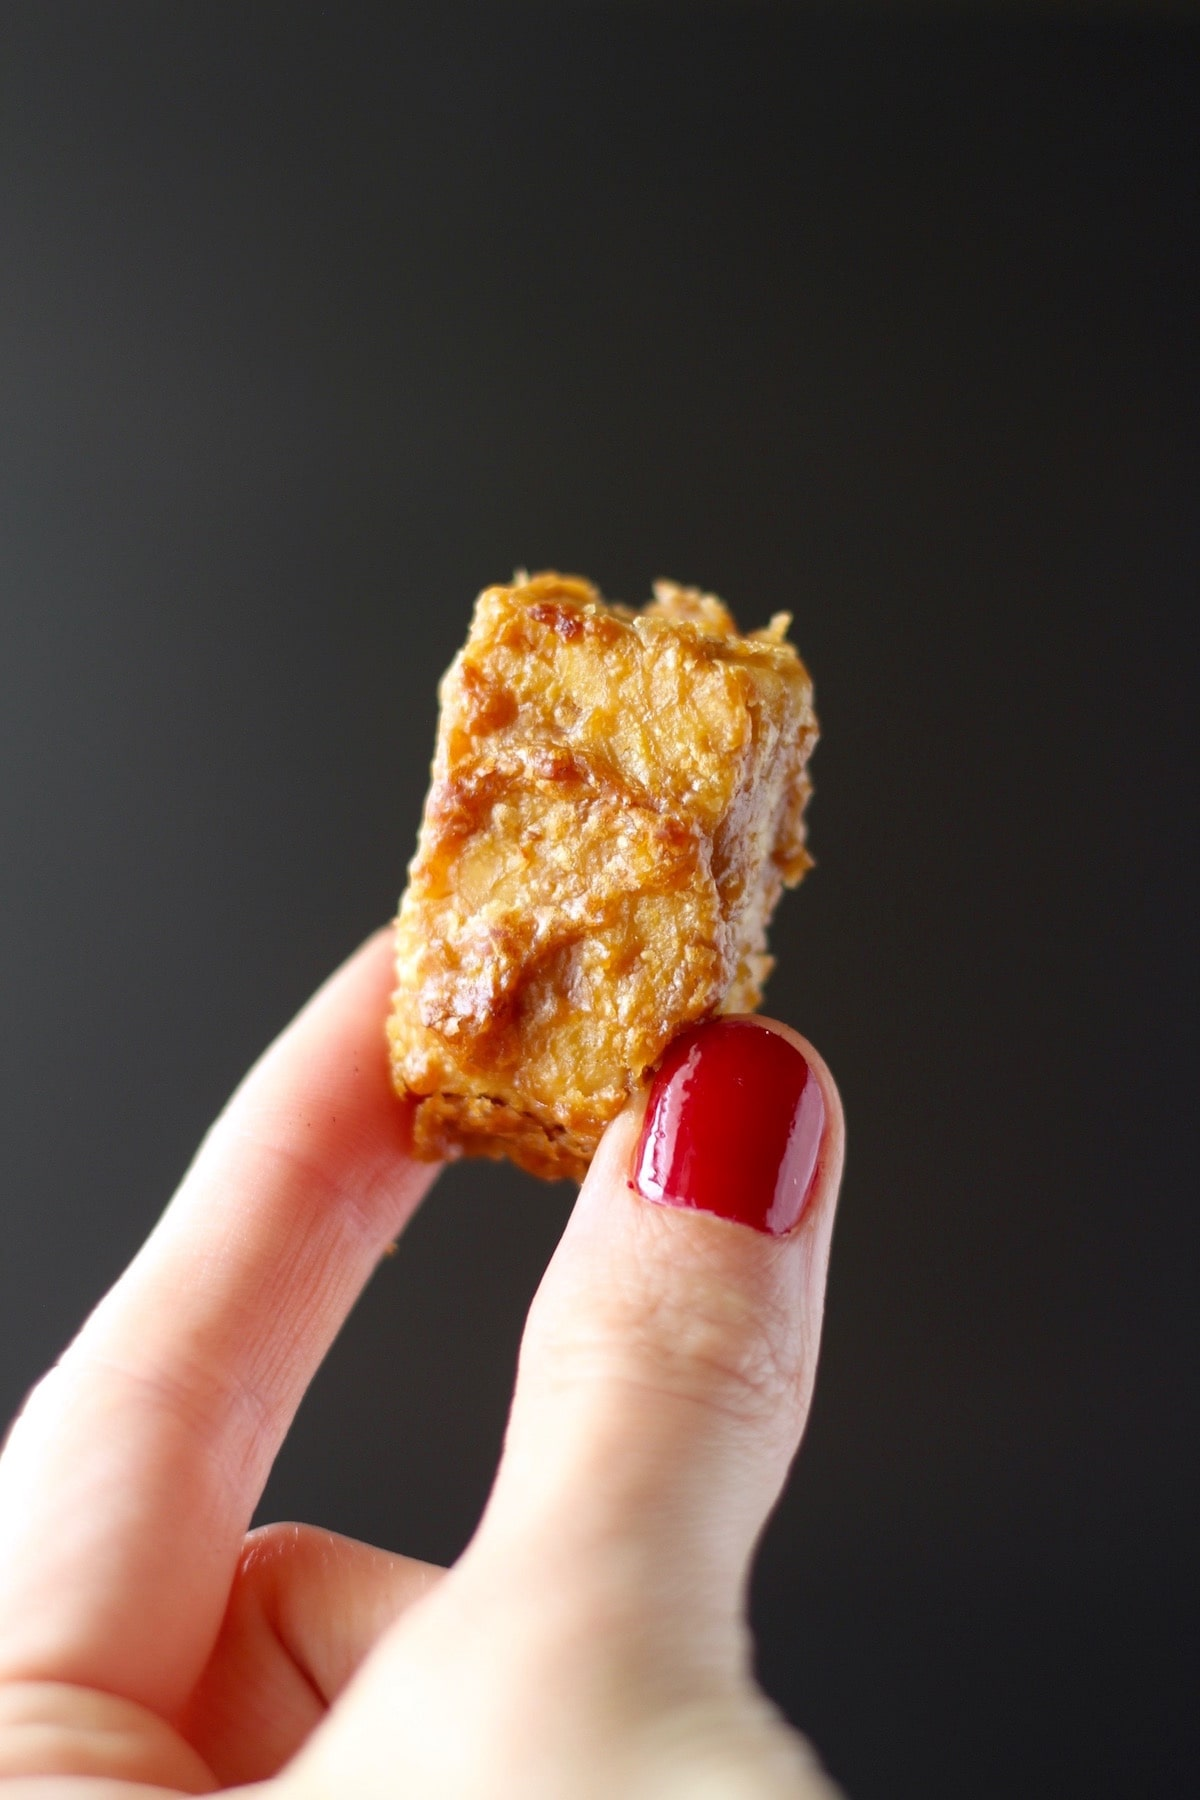 A golden brown baked tempeh bite